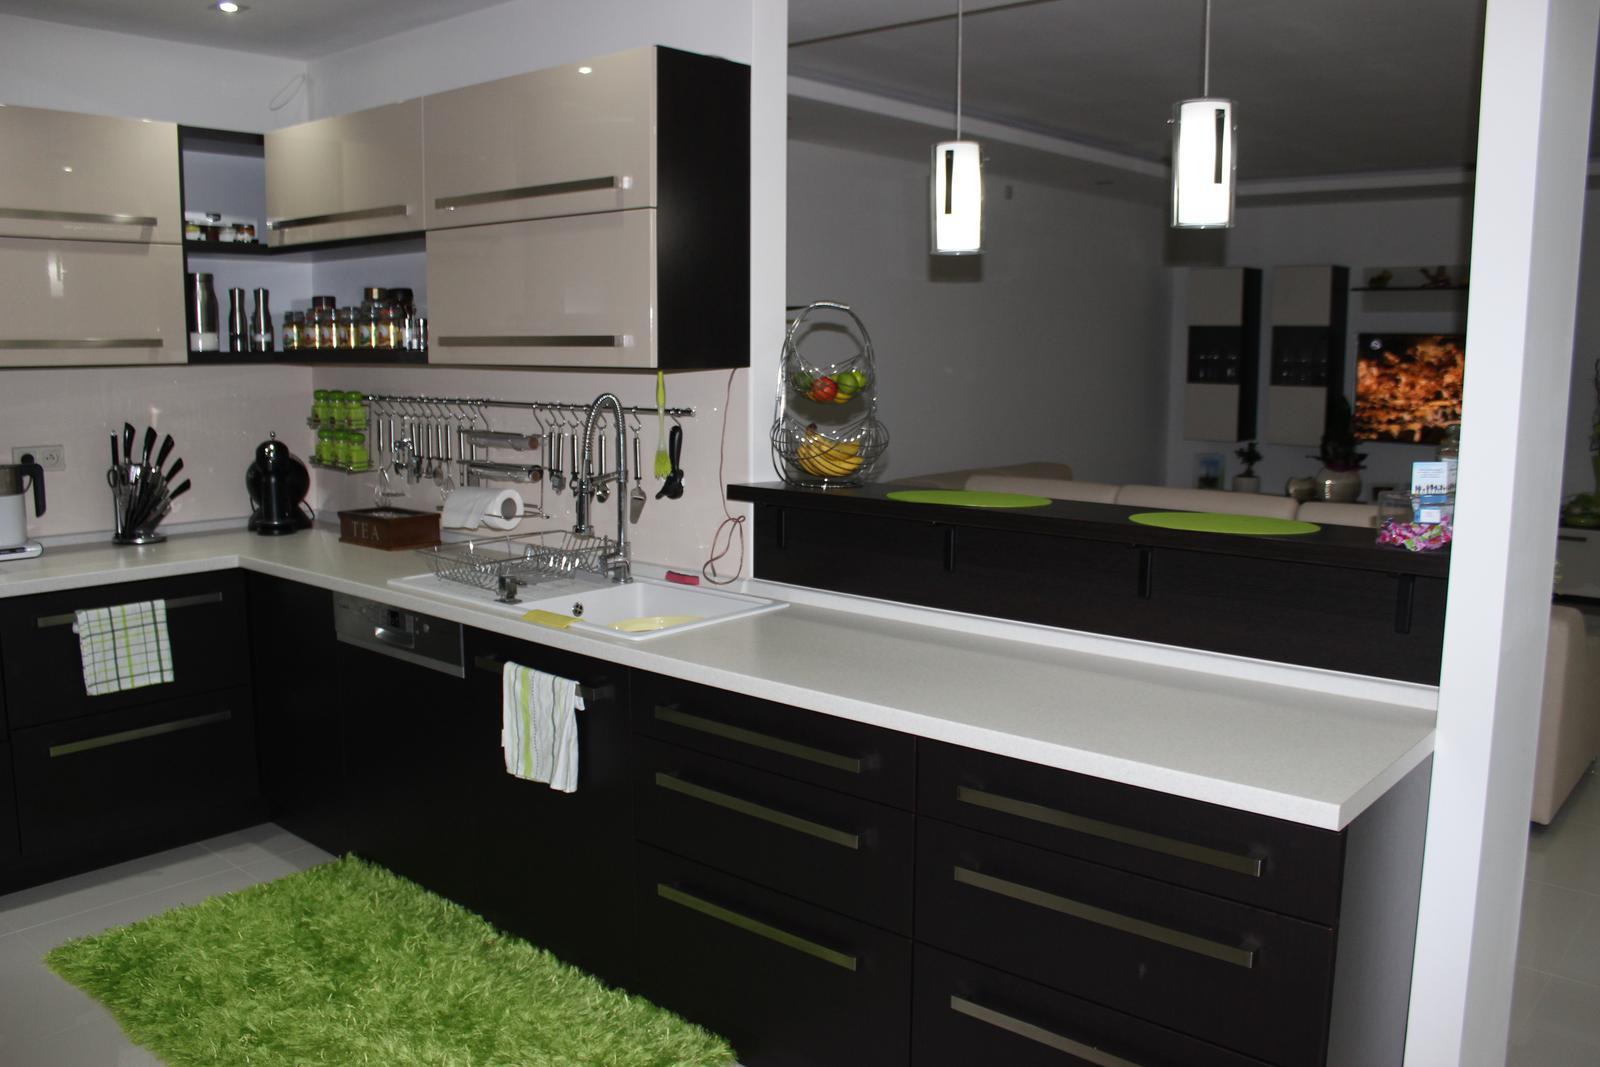 Naša kuchyňa :) - Obrázok č. 7